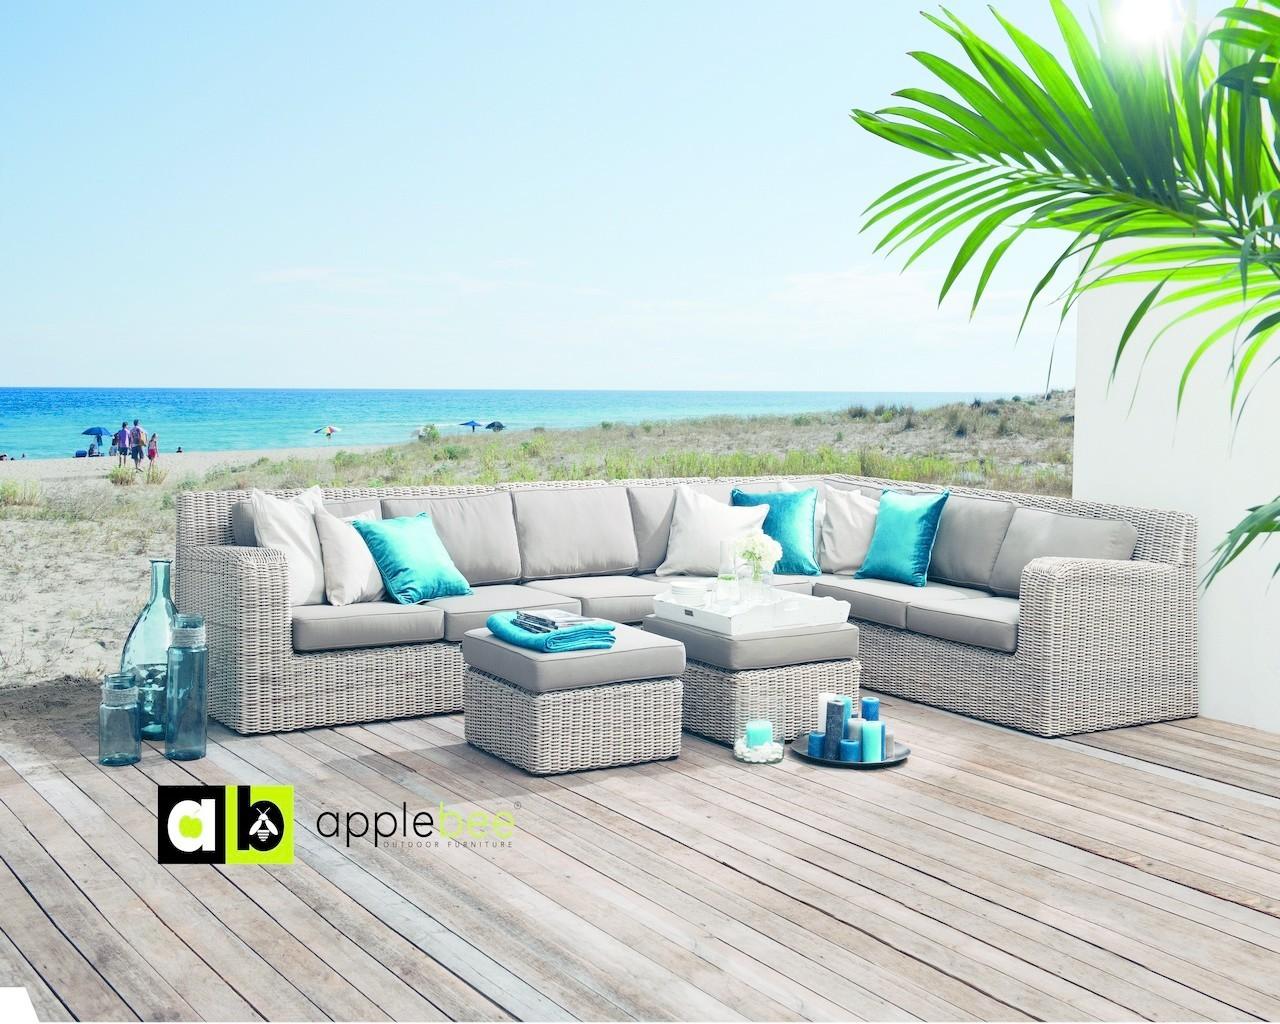 loungeset-horizon-applebee-hoekbank-taupe-elementen-wicker-seashell